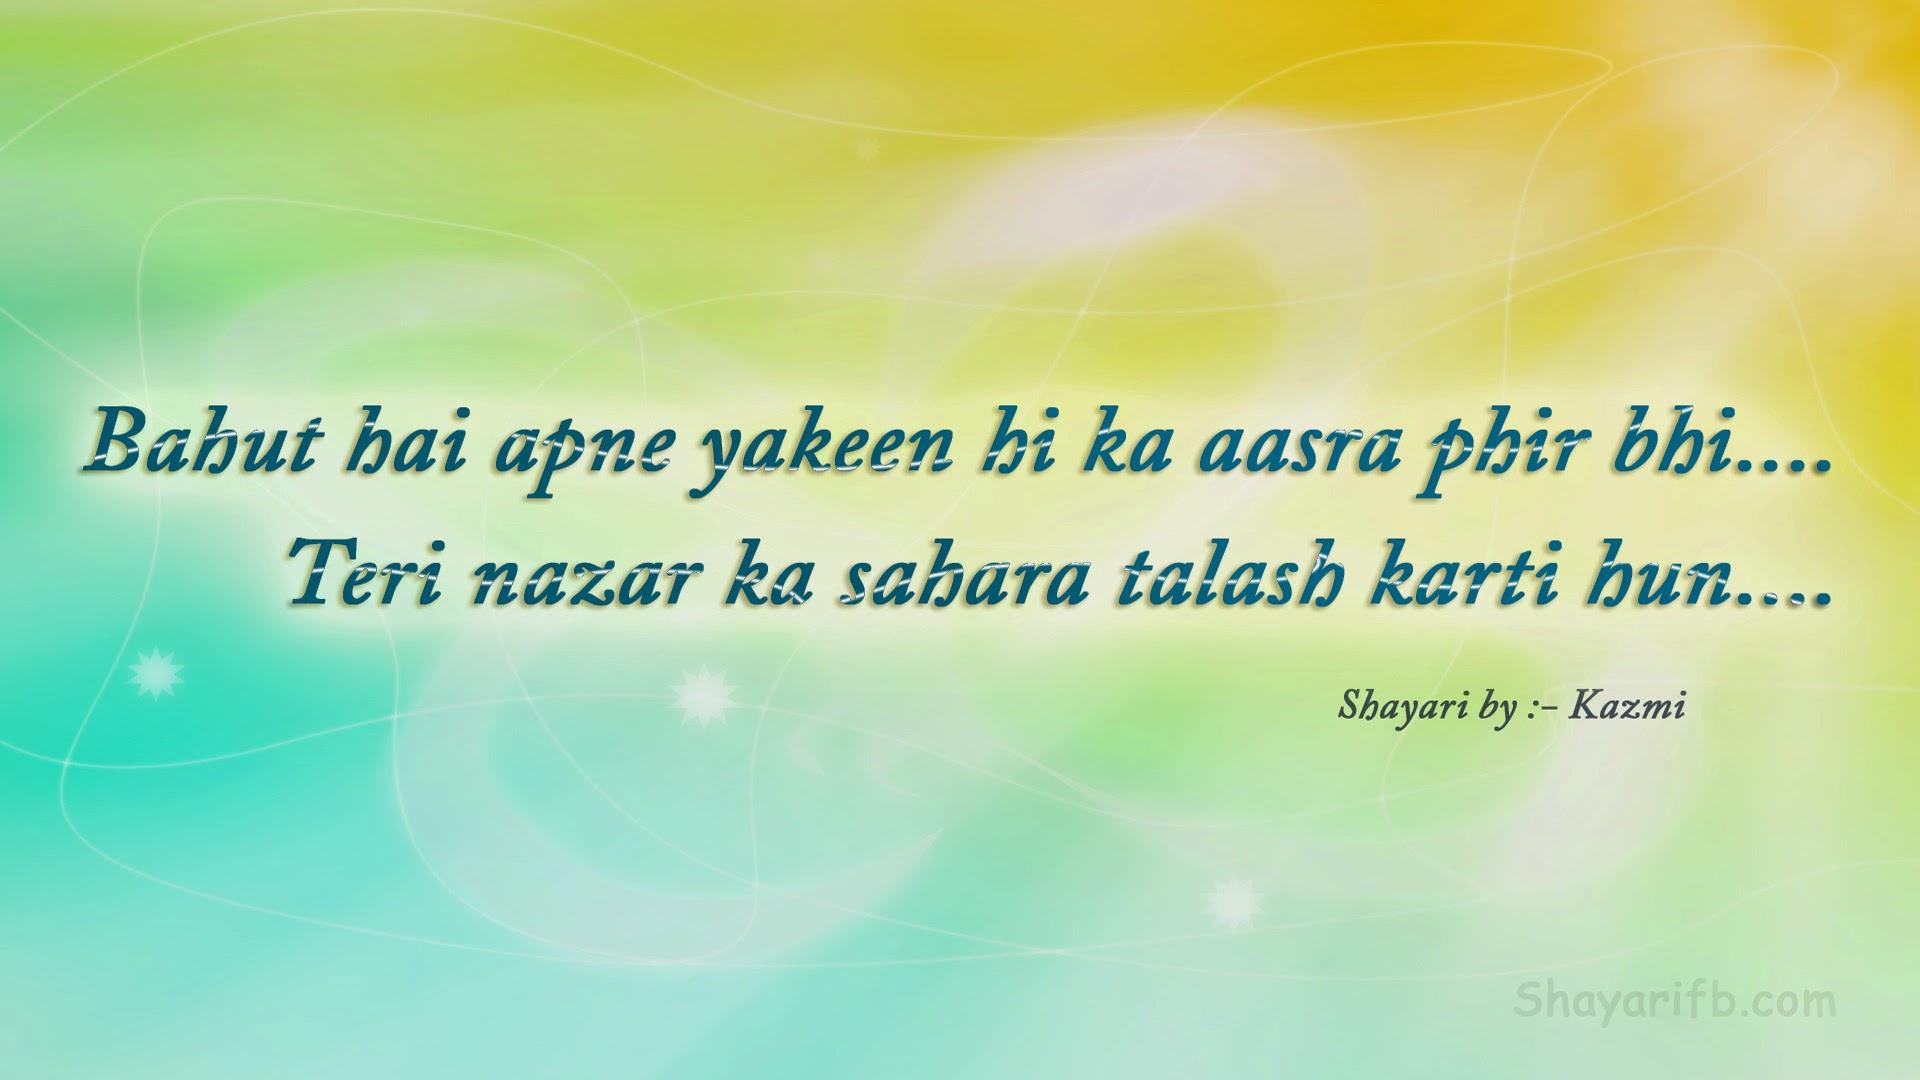 Sad Images | Sad wallpapers | Sad Shayari : Beautiful shayari in Hindi